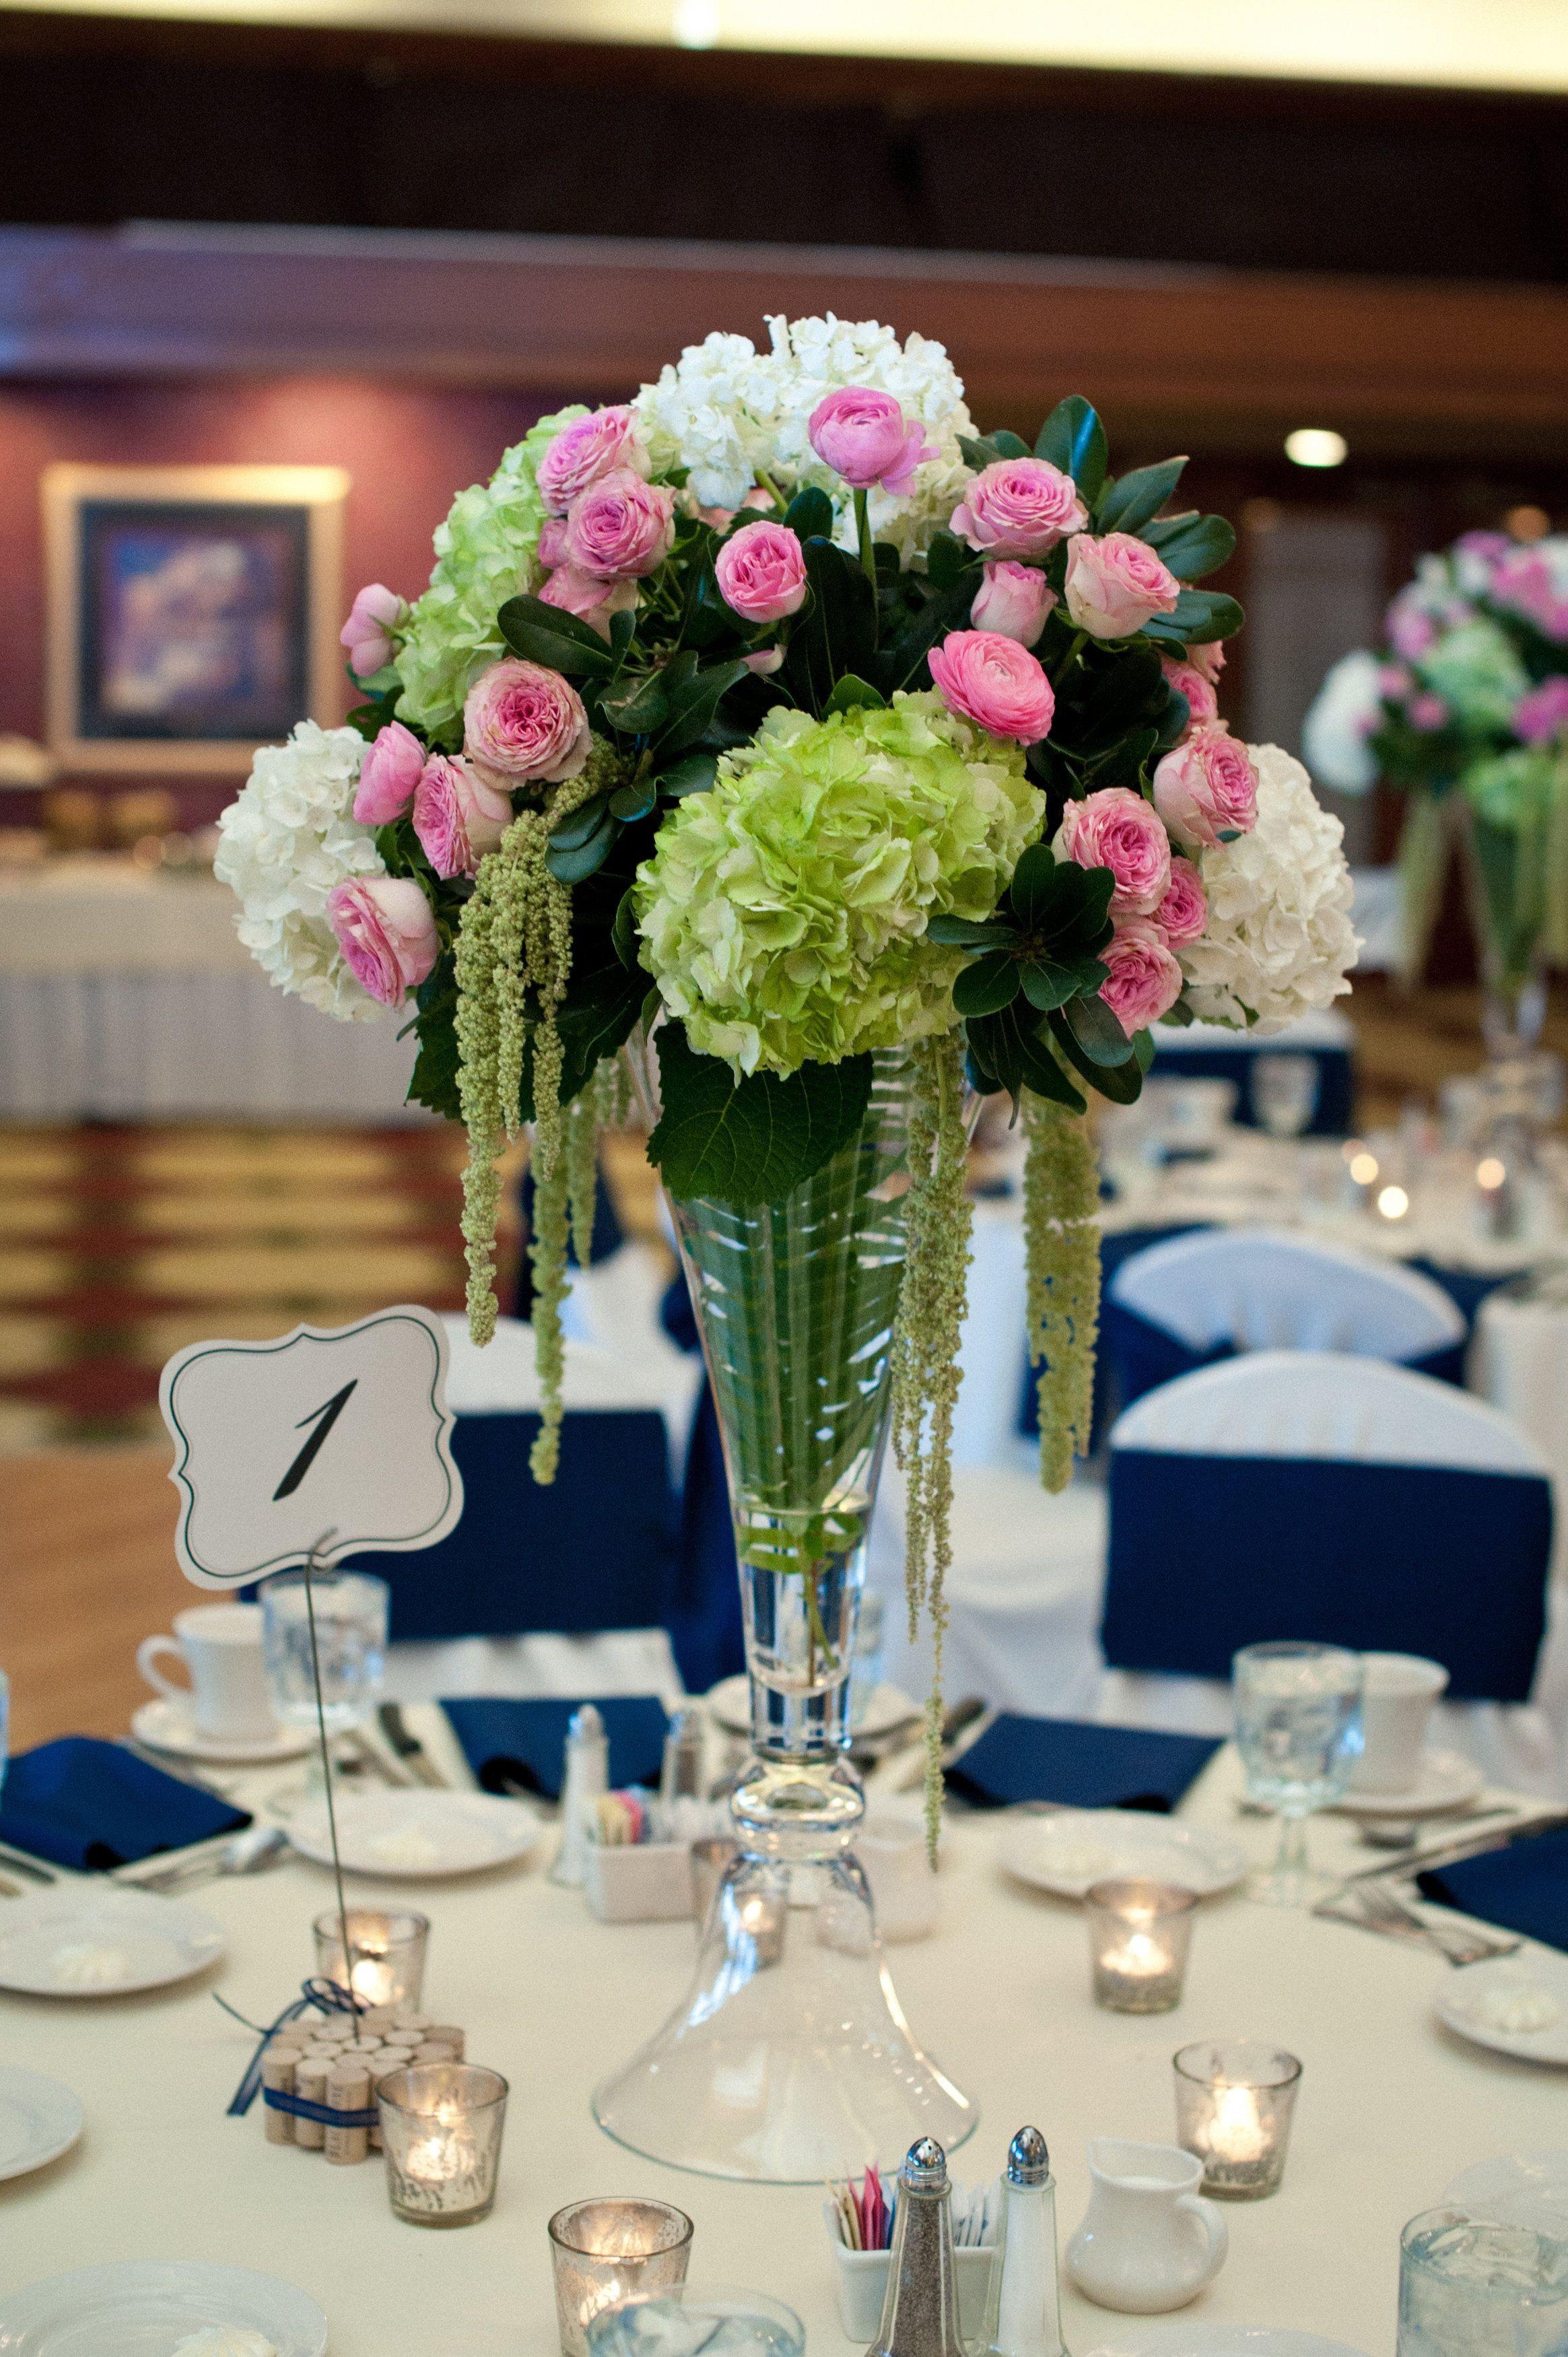 hydrangea centerpieces in square vases of 26 luxury wedding centerpieces ideas sokitchenlv for tall wedding centerpieces green hydrangea pink garde